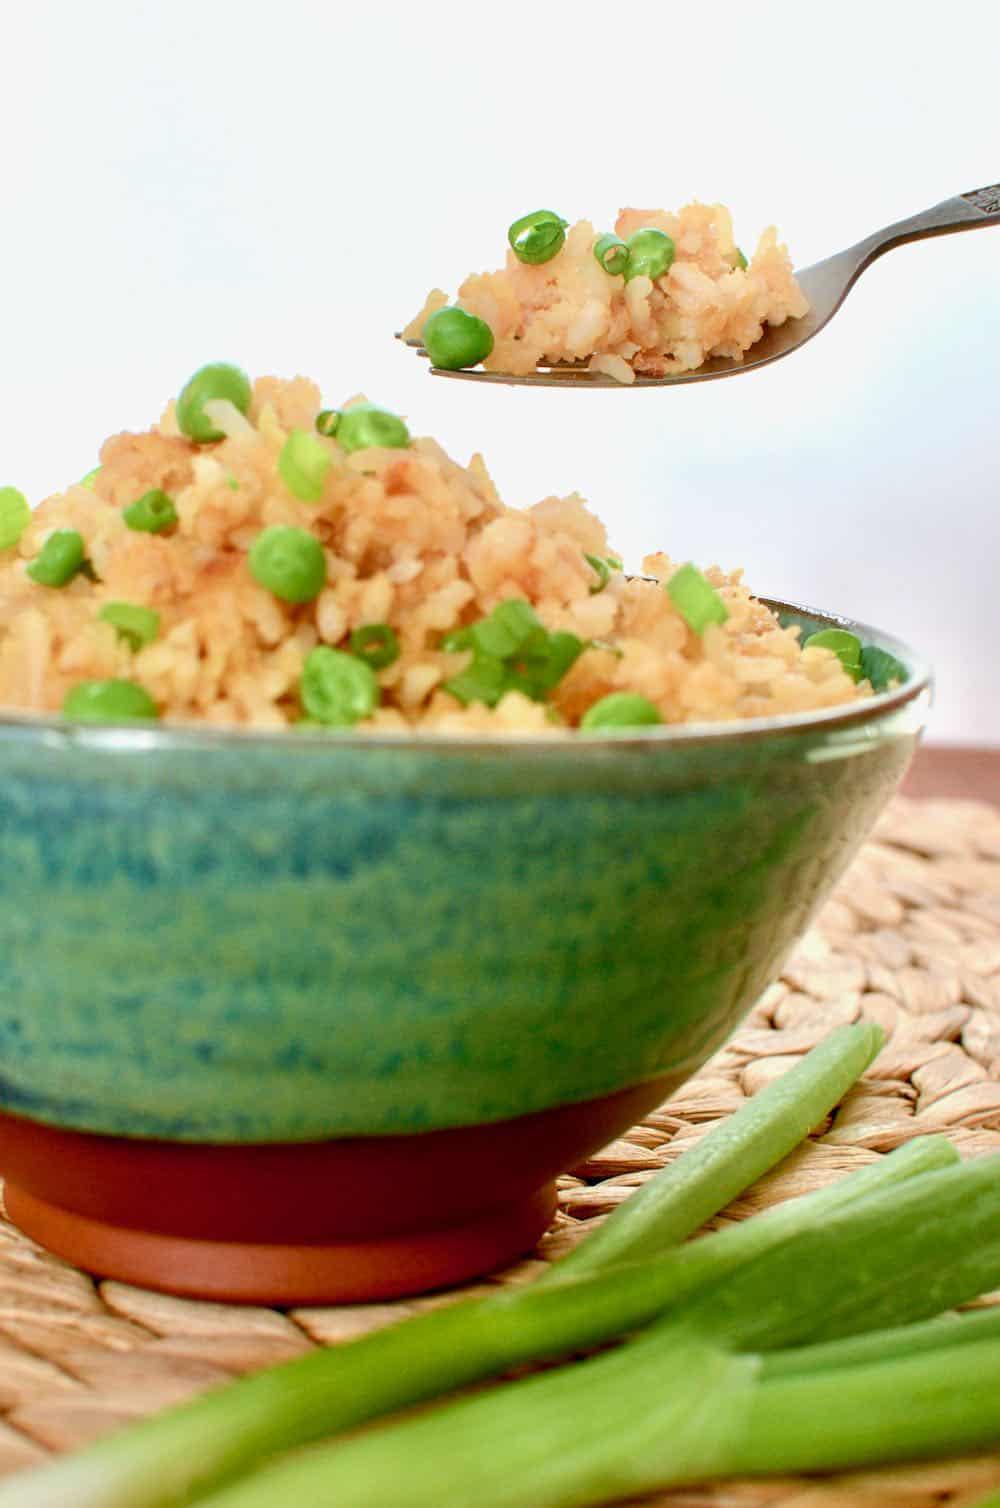 Taking a forkful of the tasty vegan egg fried rice